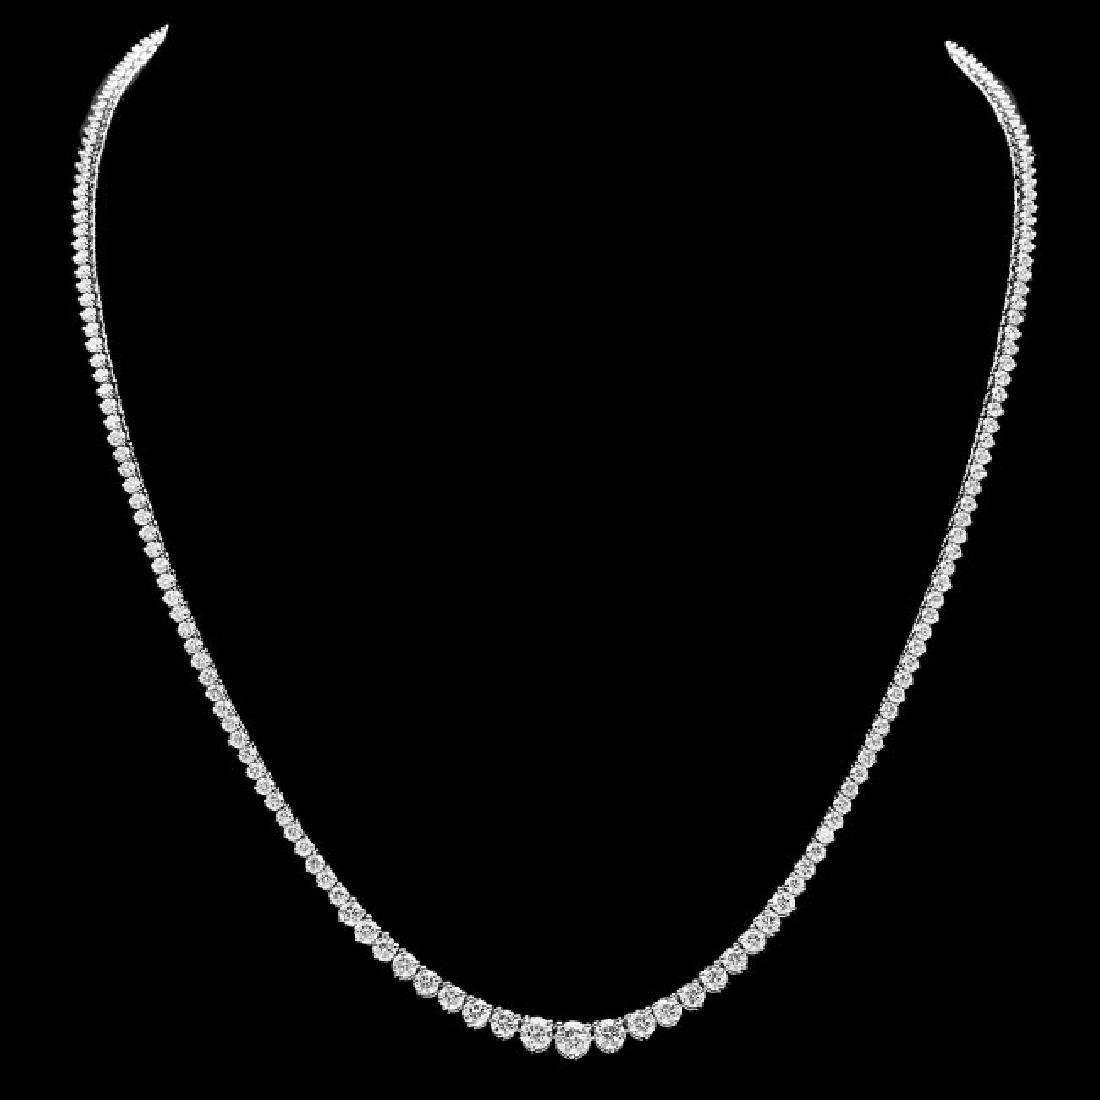 14k White Gold 9.30ct Diamond Necklace